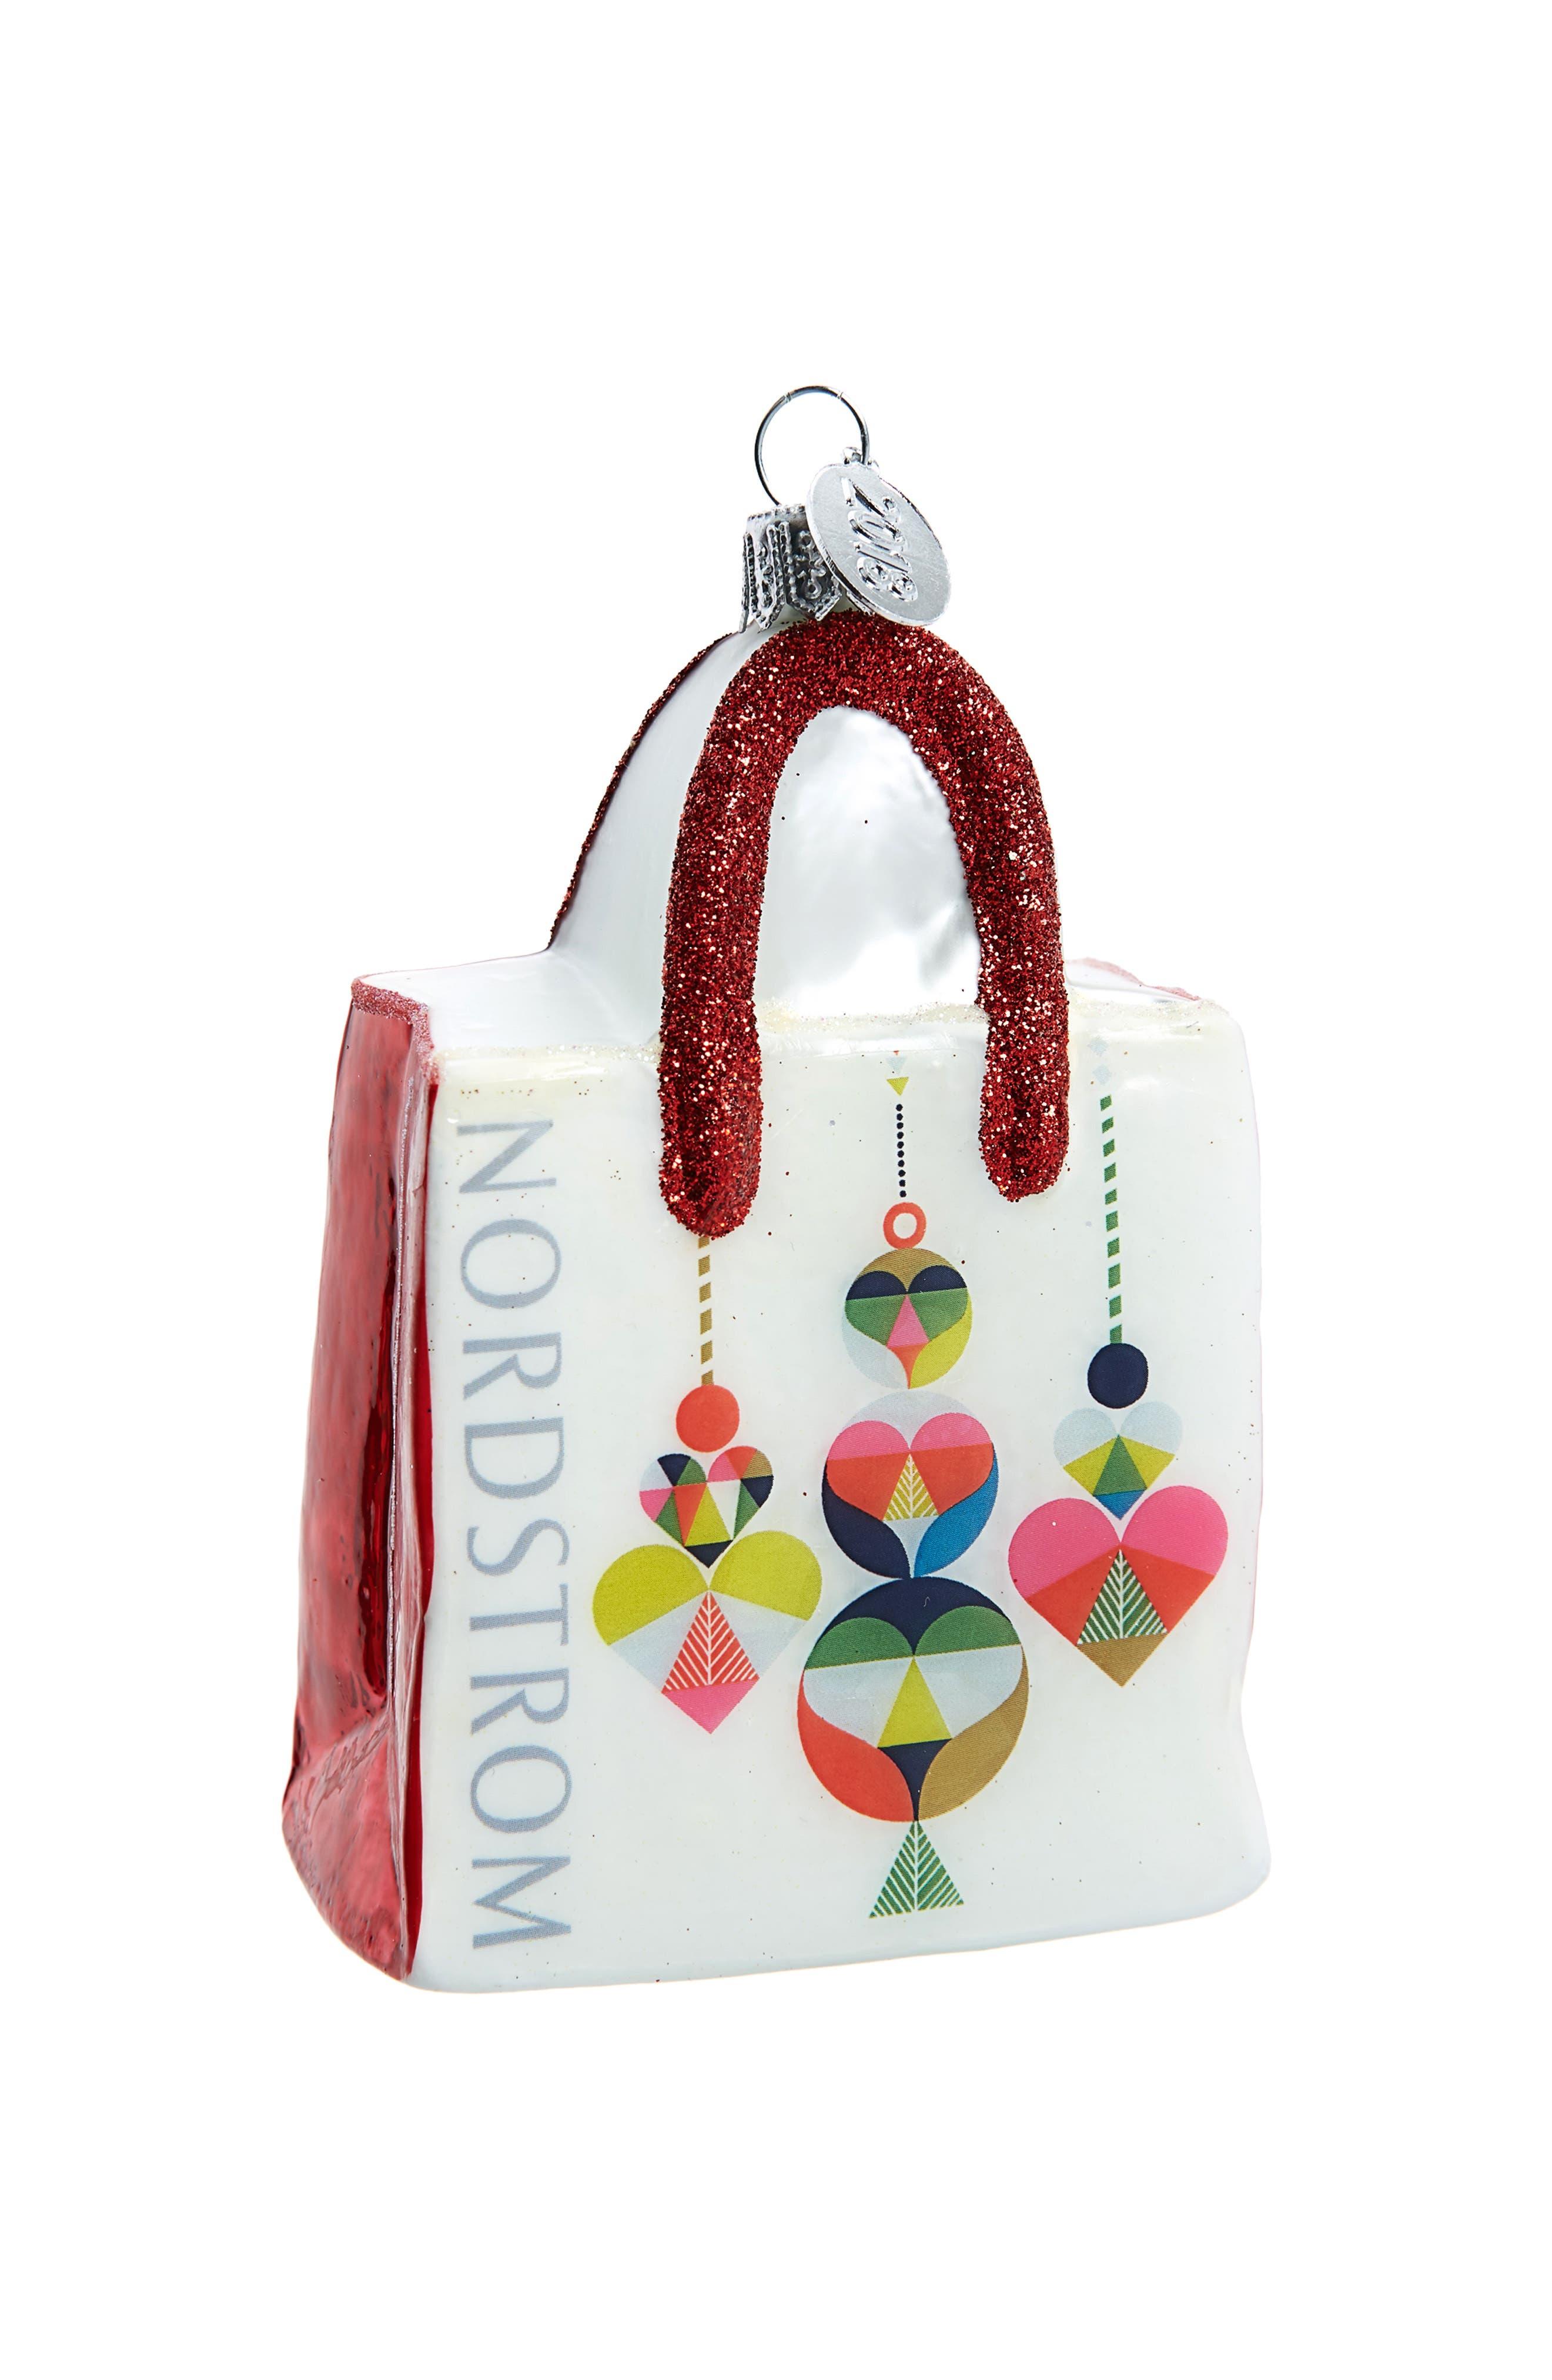 Nordstrom Shopping Bag 2018 Ornament, Main, color, 100